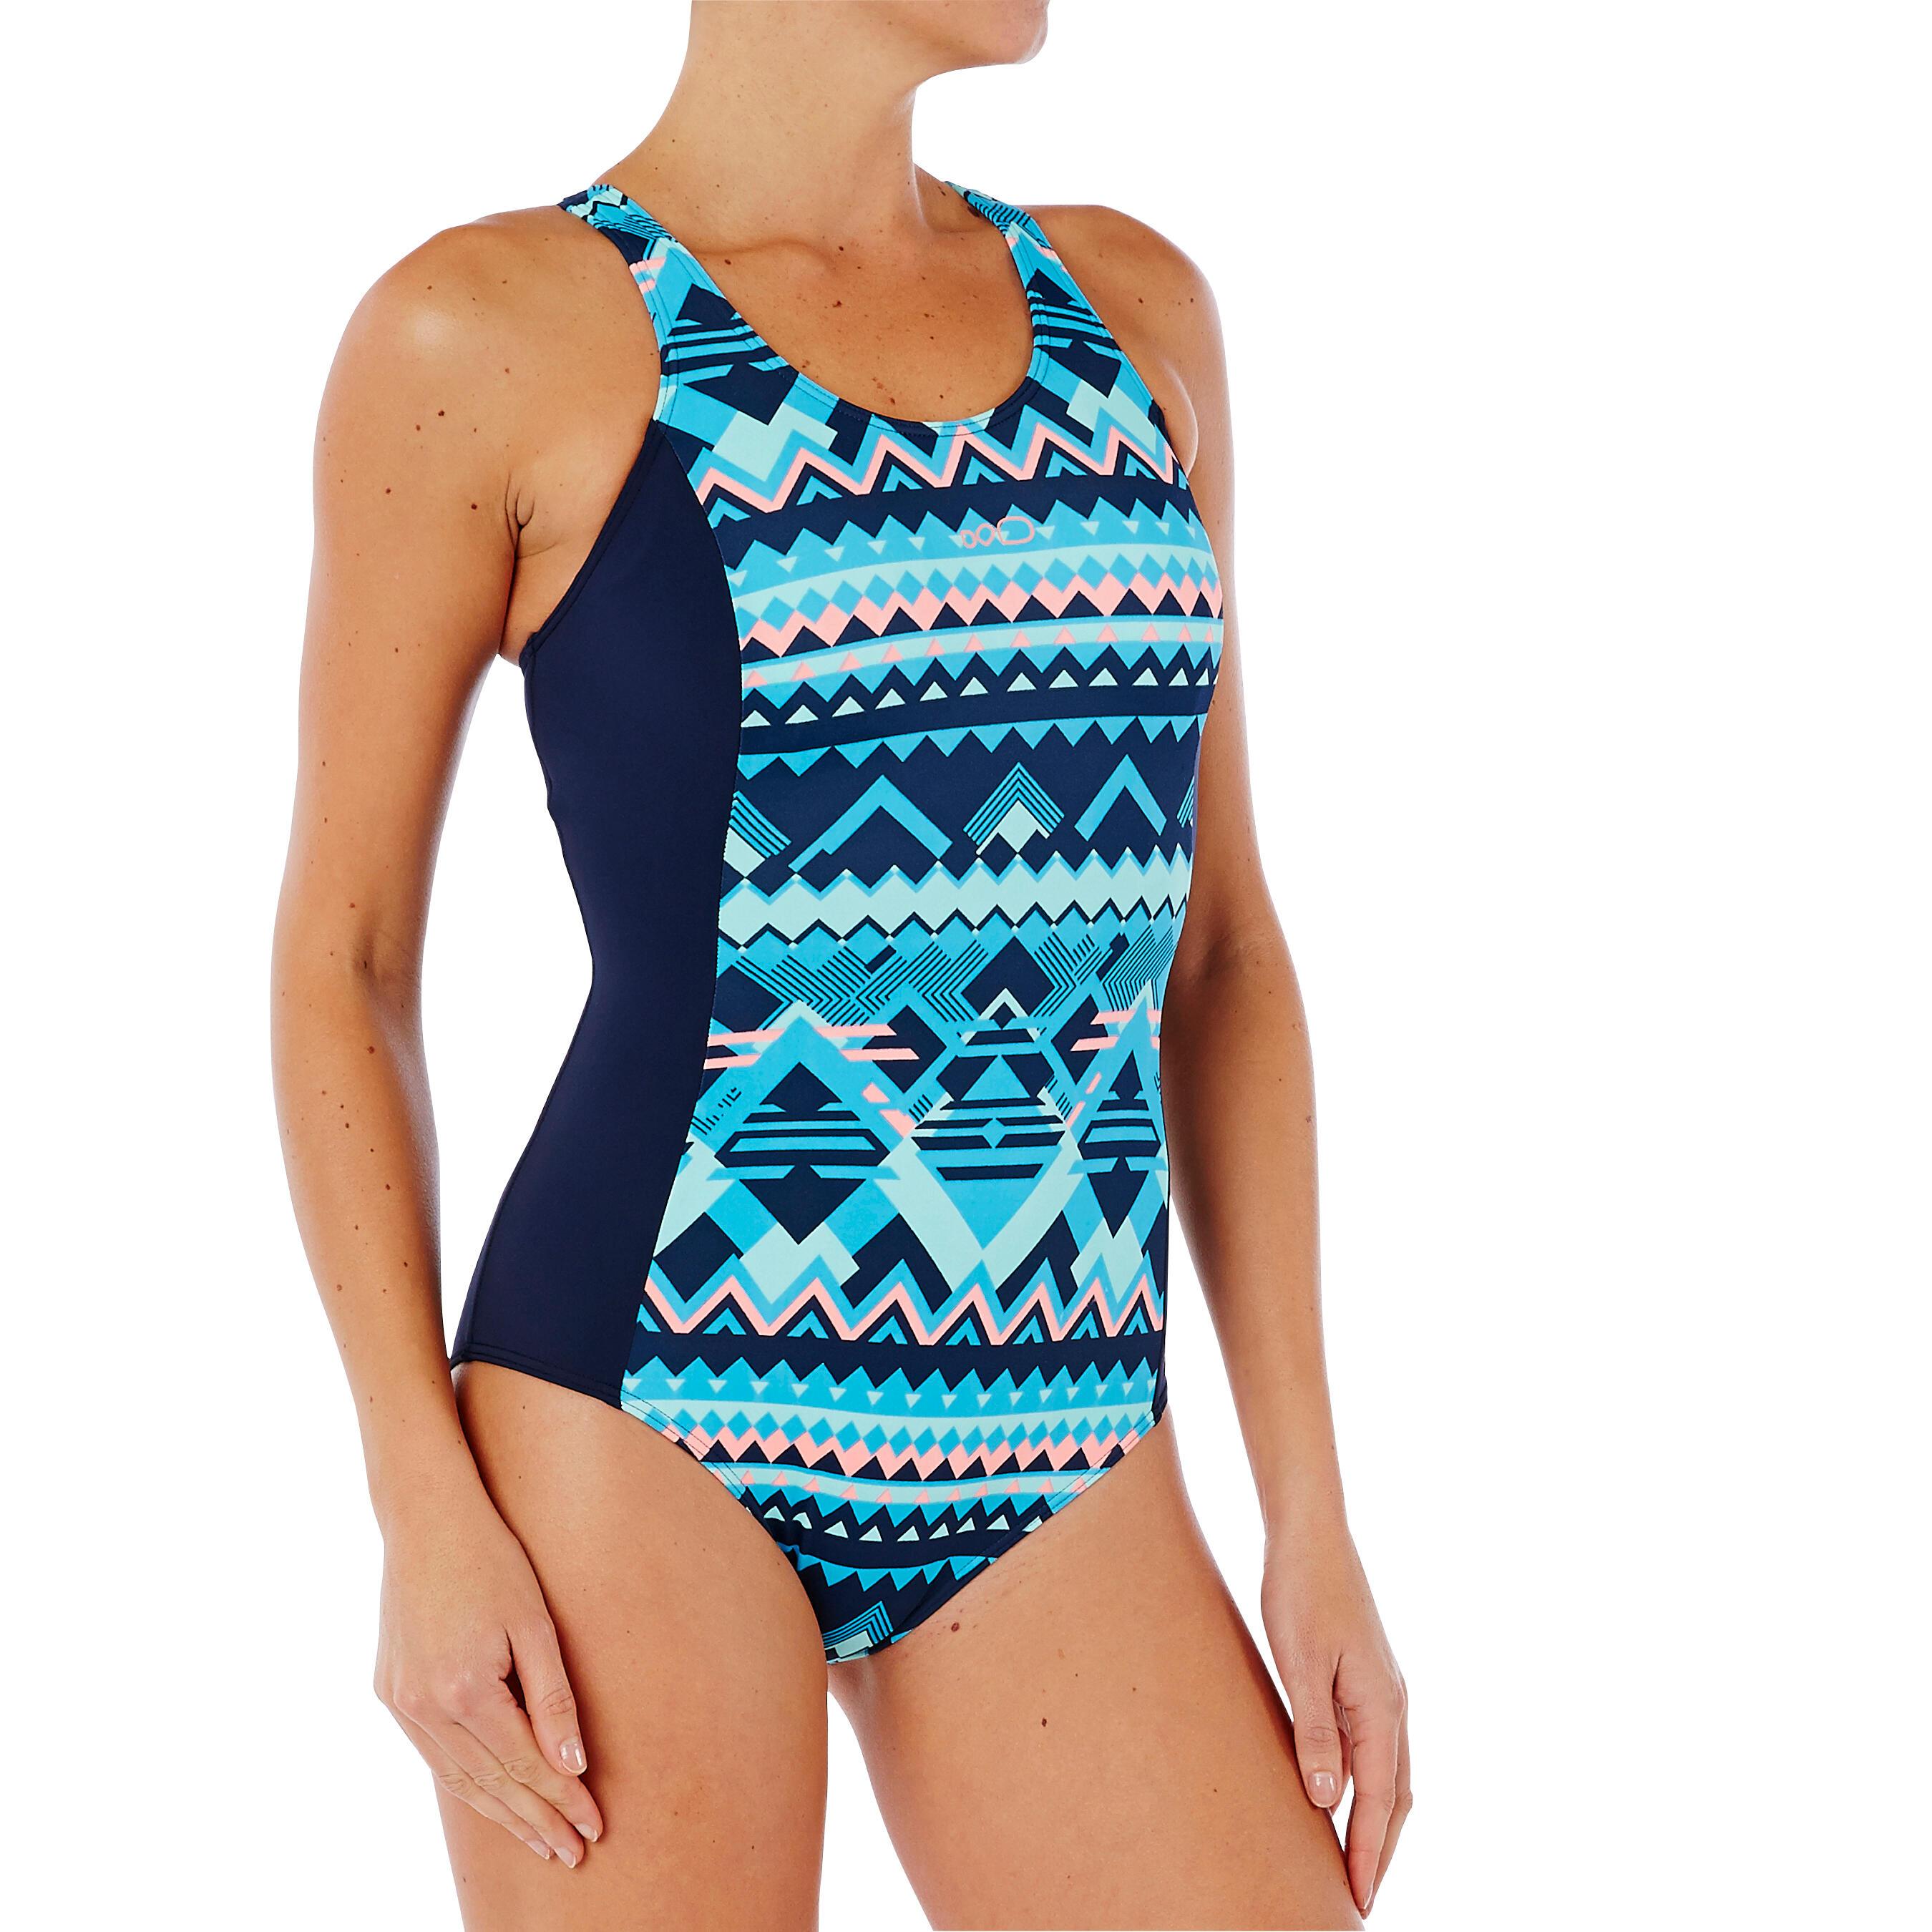 Vega Women's One-Piece Swimsuit - Black Blue